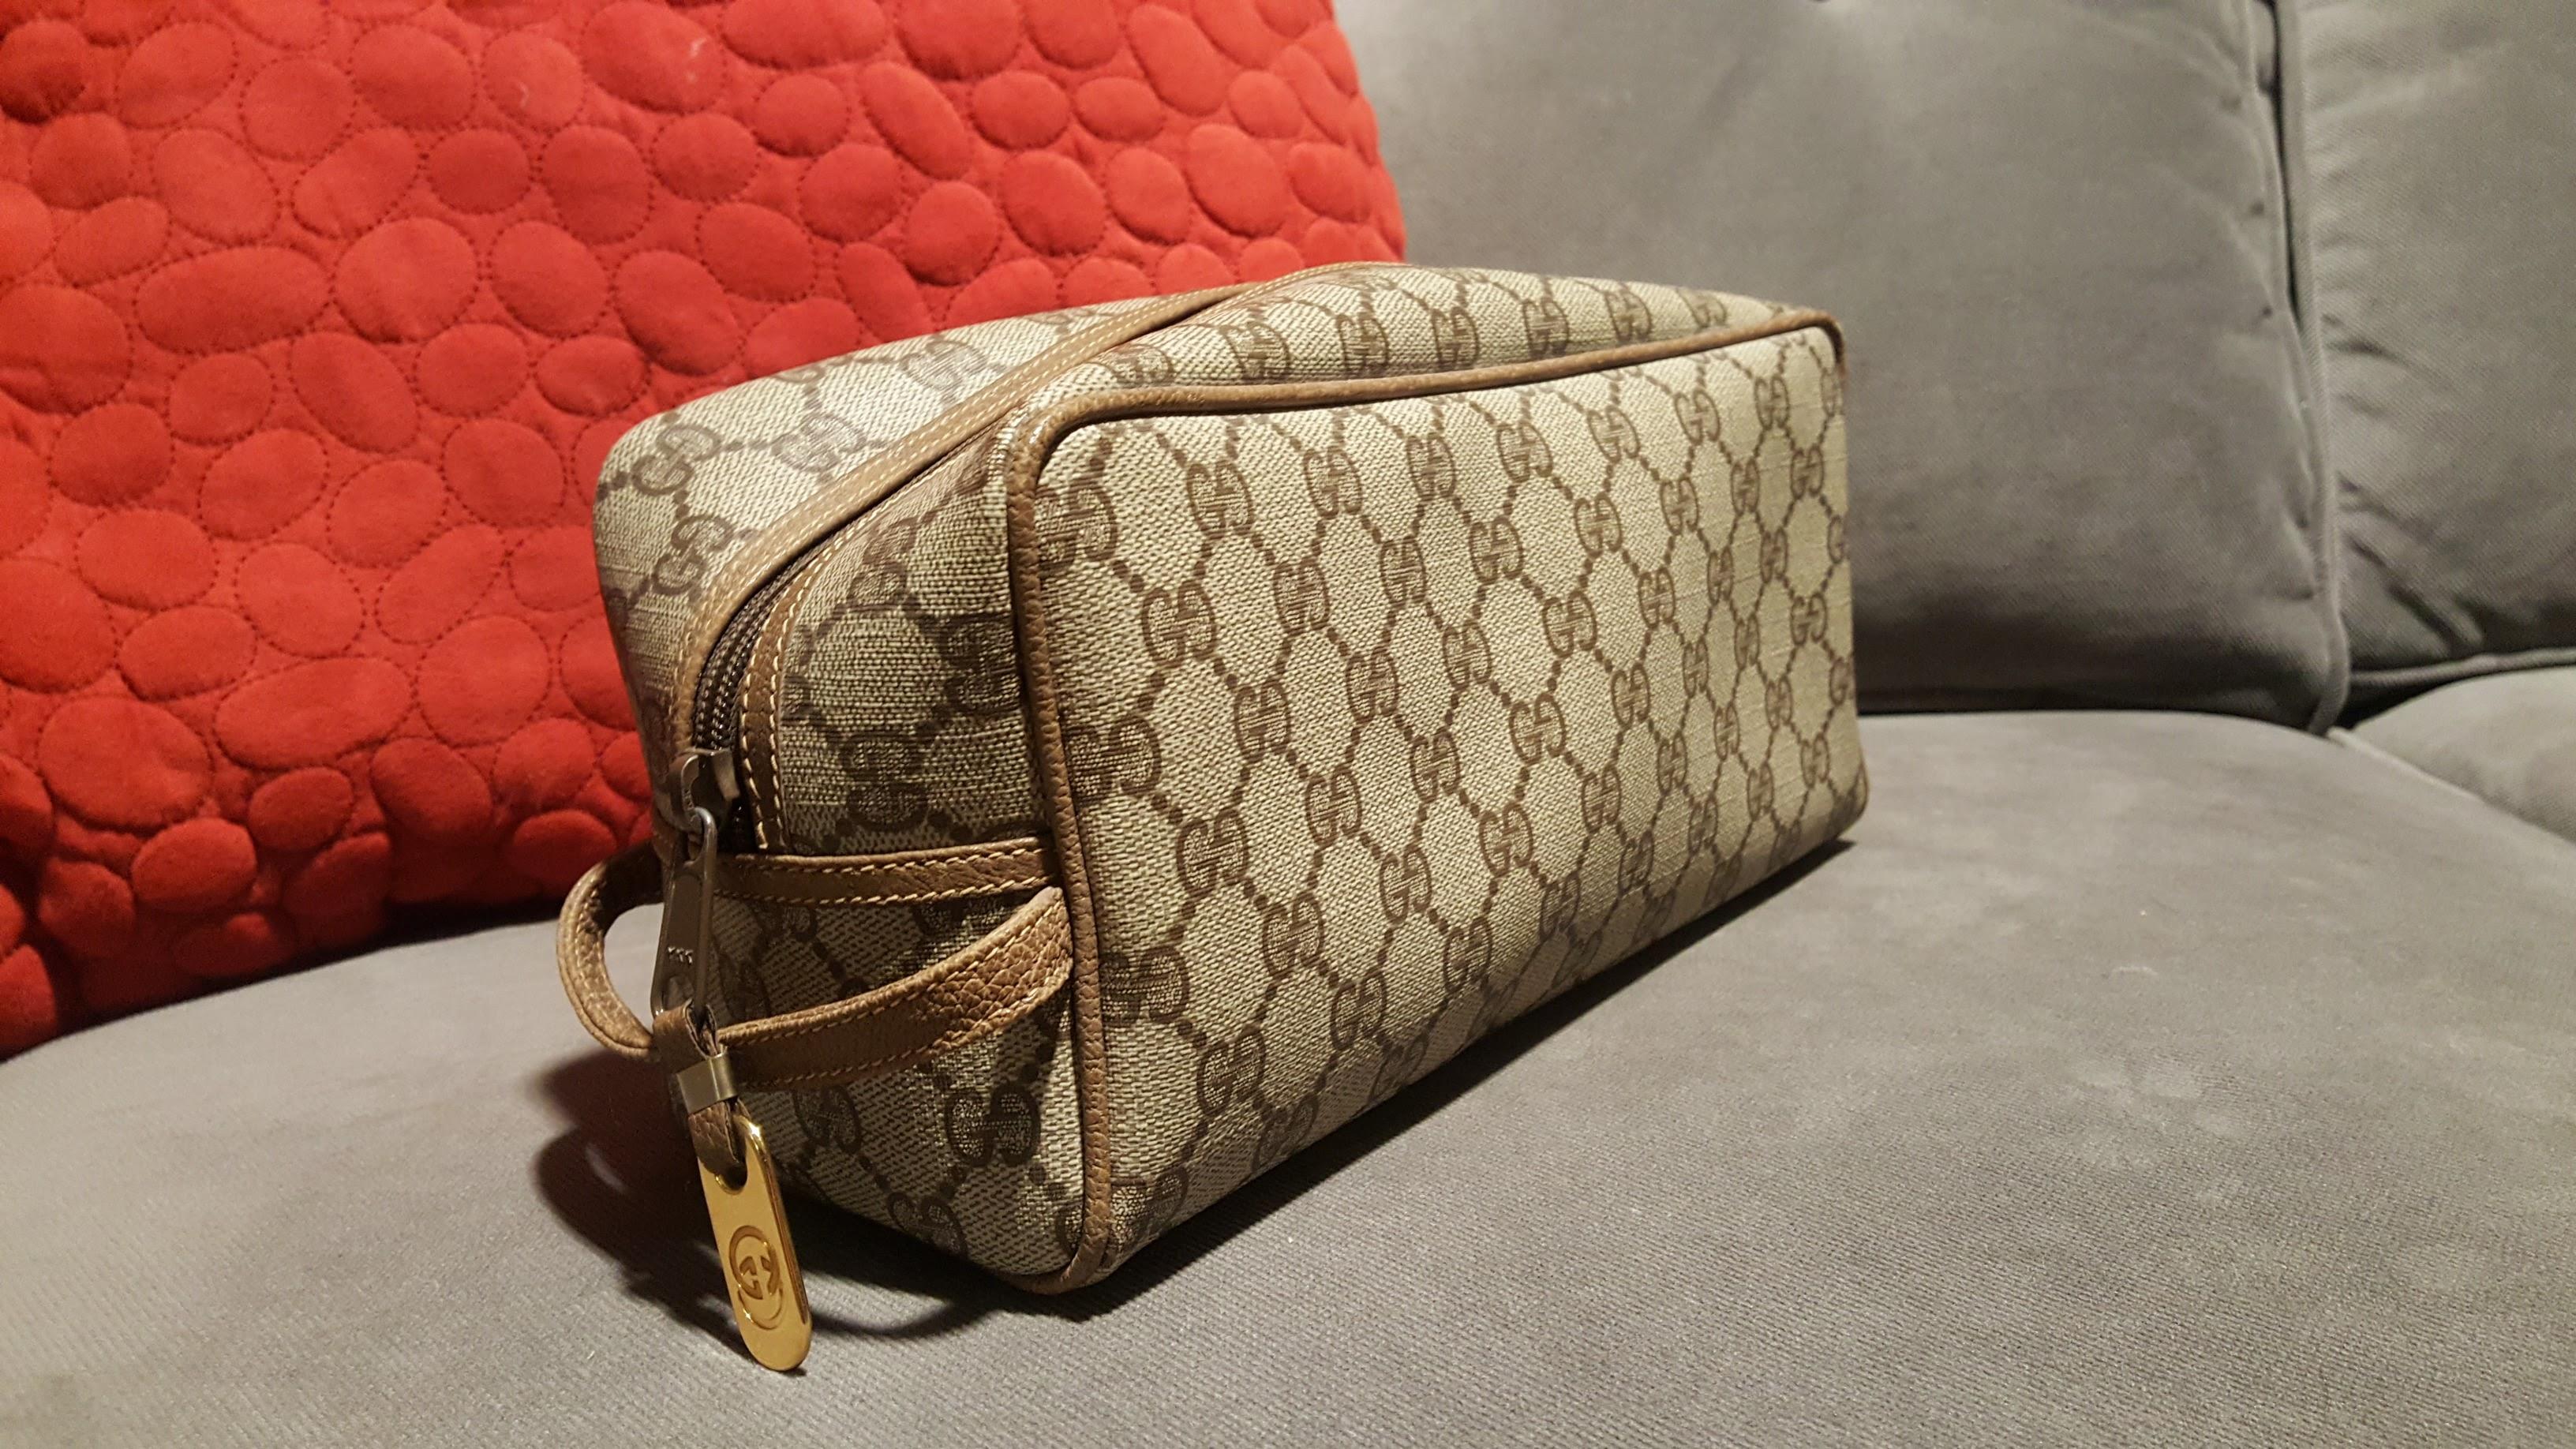 baa9ce32da83 Gucci Toiletry Bag / Dopp Kit /shaving Bag | Grailed